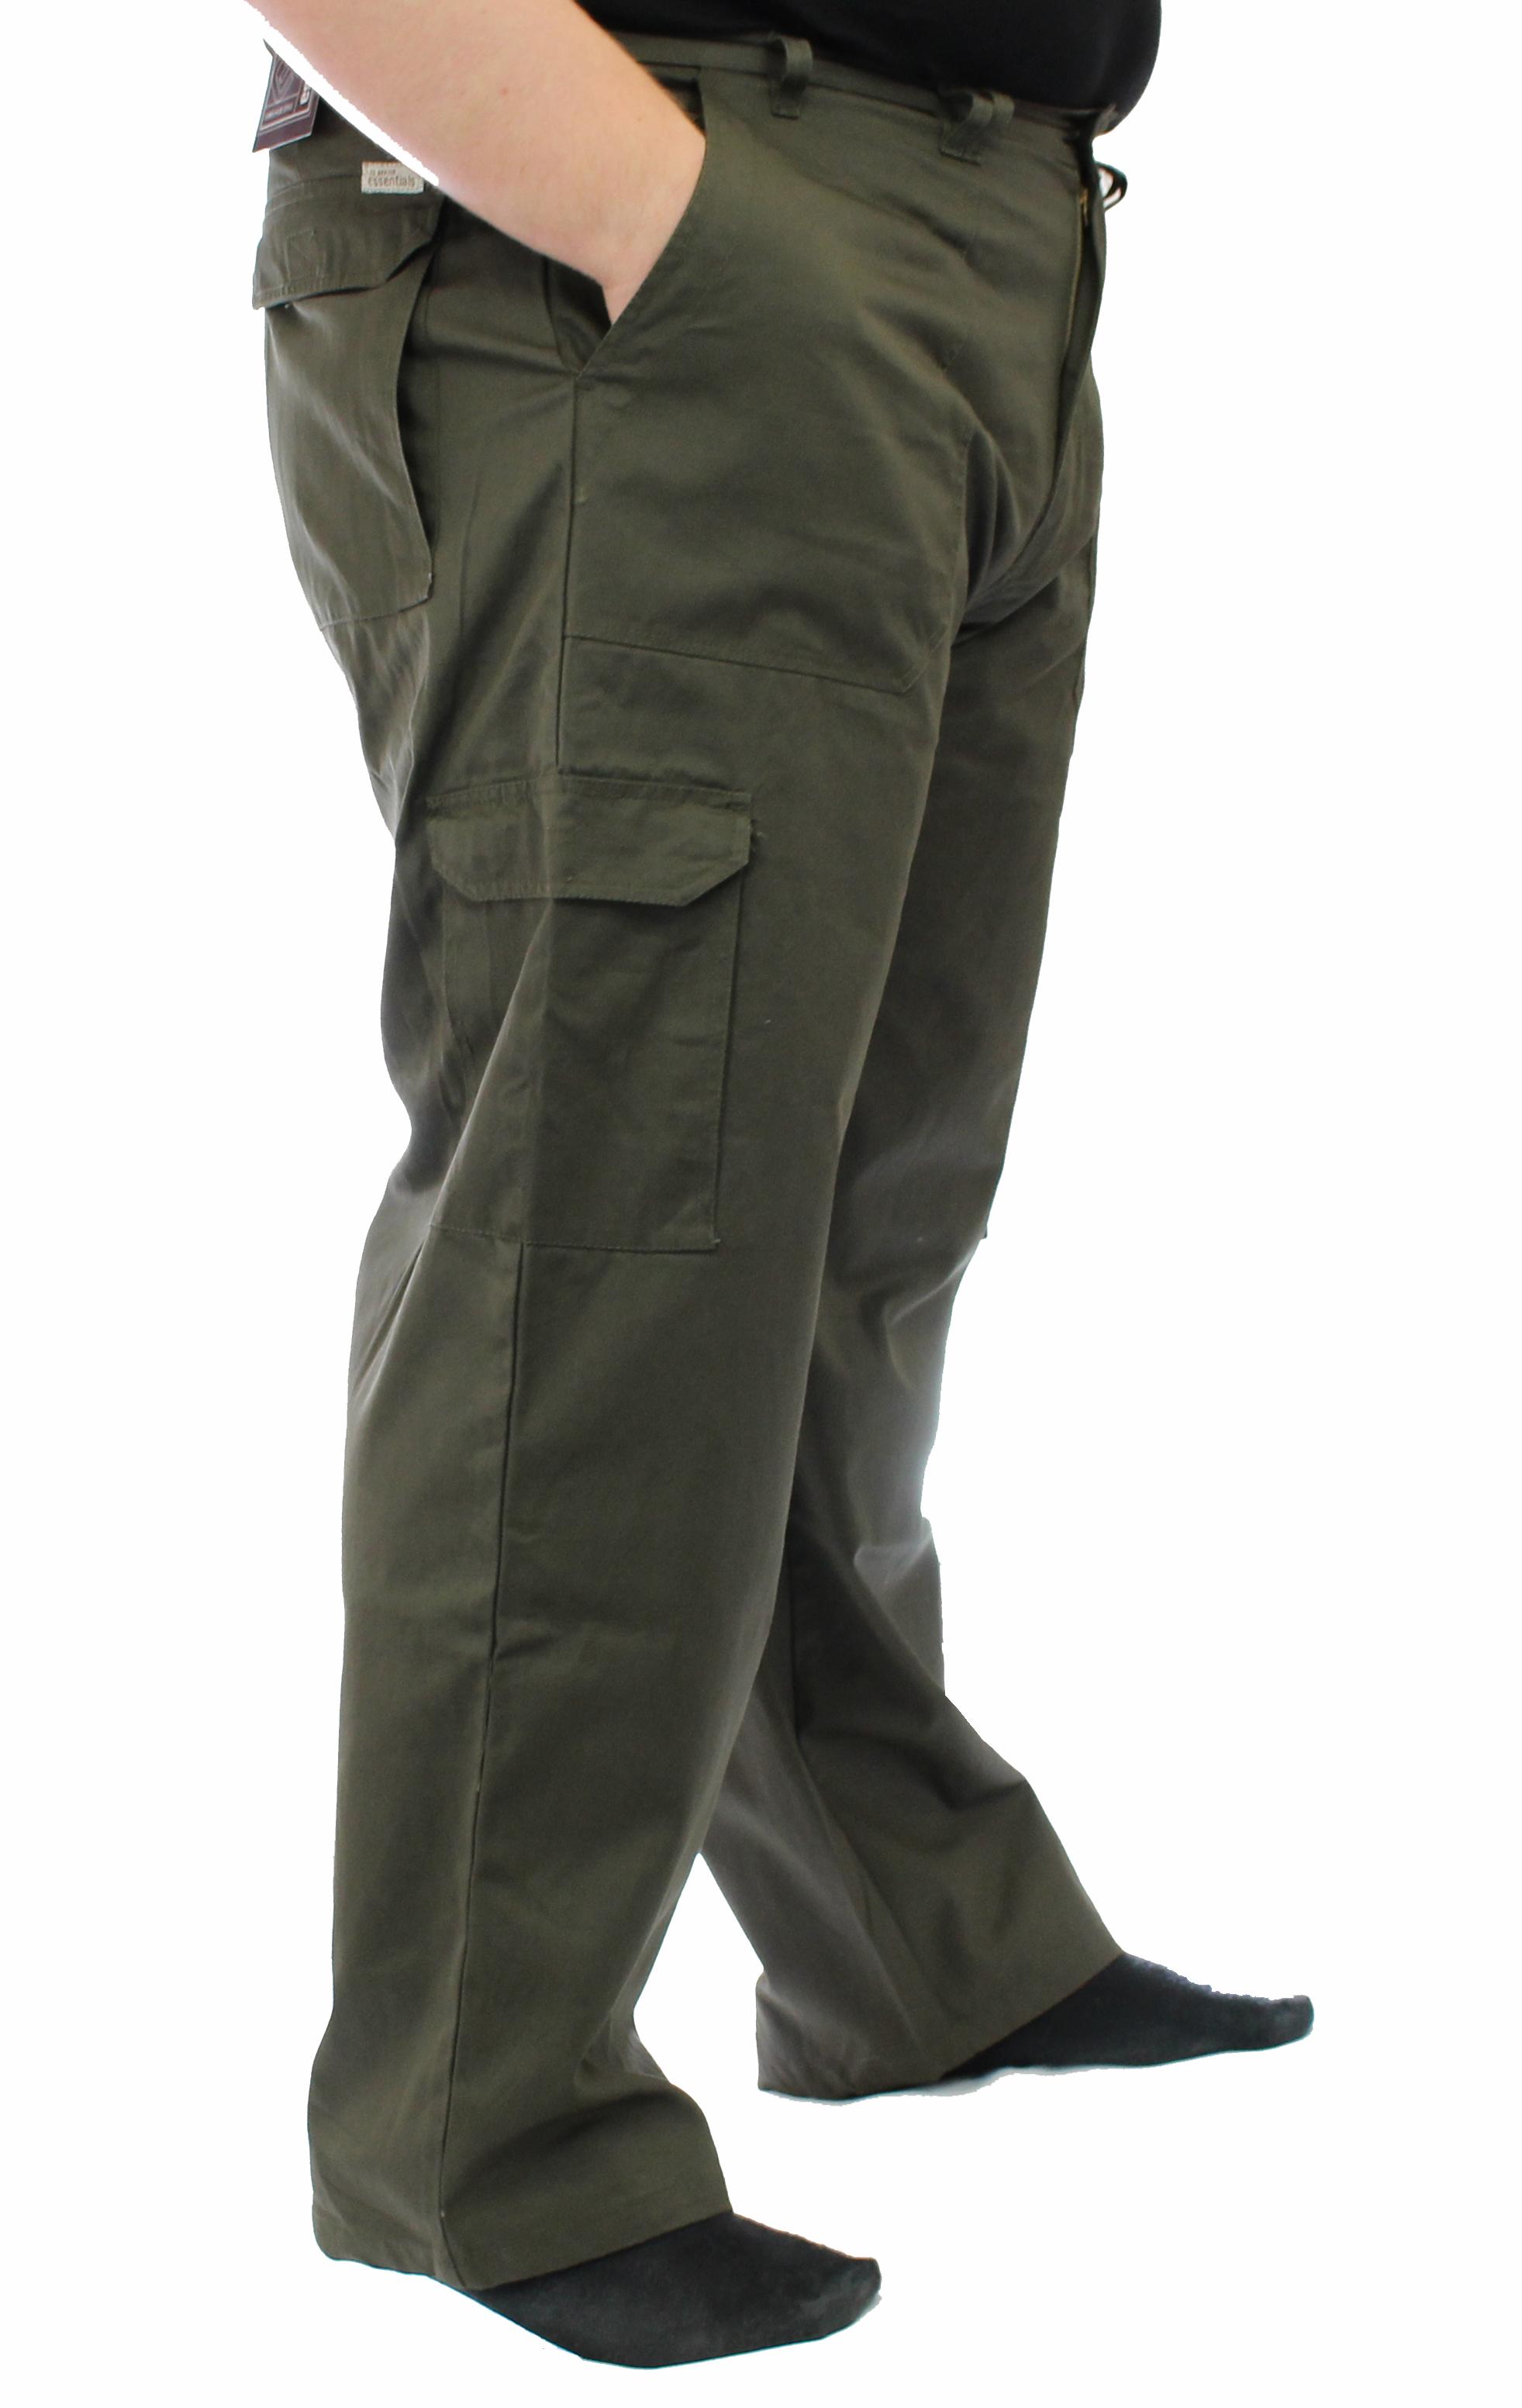 "Ed Baxter Victory - Heavy Duty Cargo Combat Trousers - Khaki - 50"" Waist, 32"" Leg"